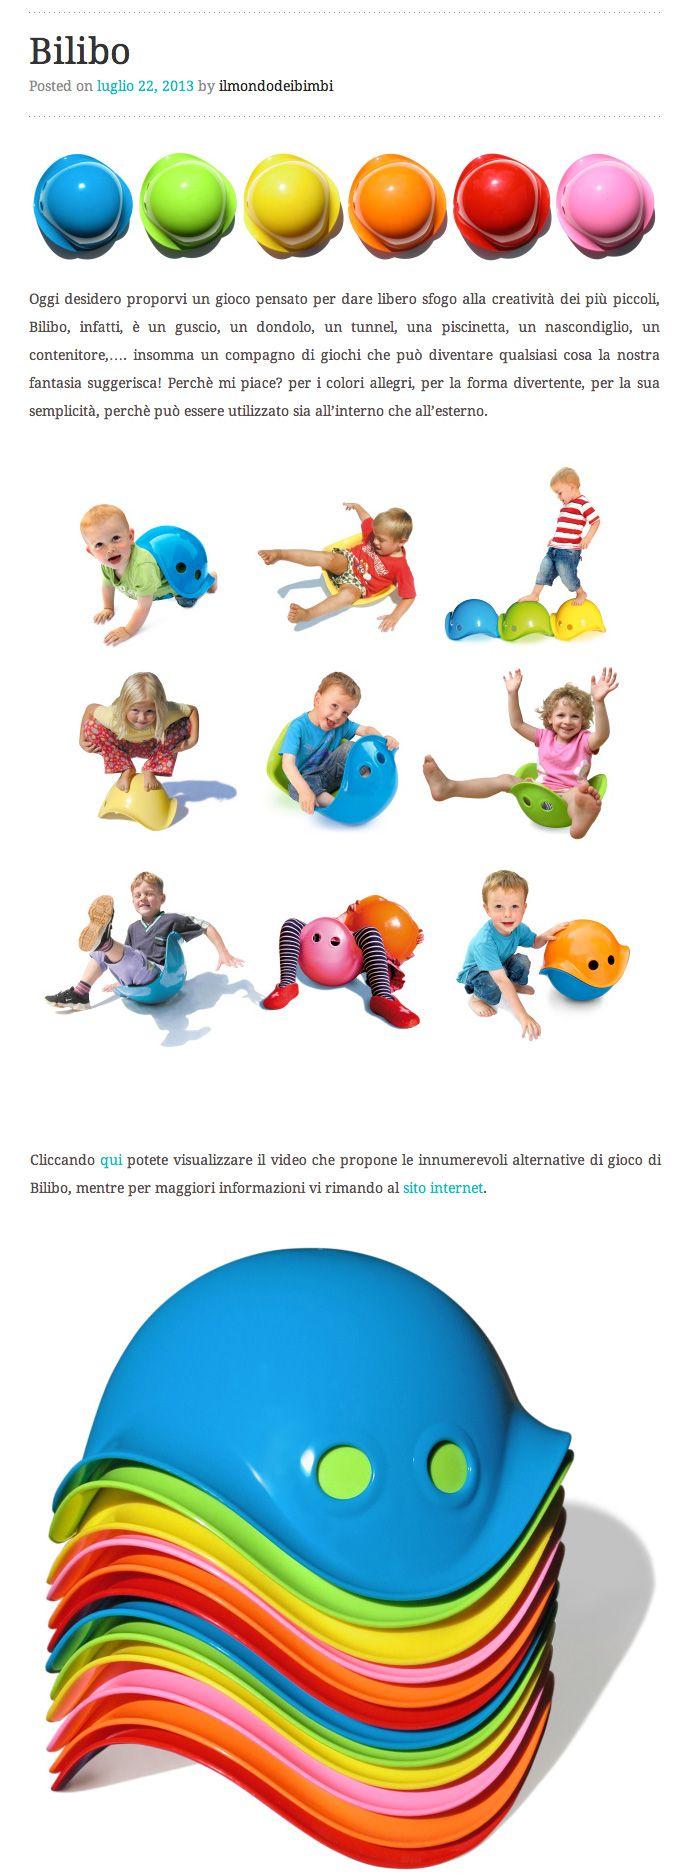 Great review from a very beautiful and stylish Italian blog: www.ilmondodeibimbi.wordpress.com/2013/07/22/bilibo #bilibo #italy #design #toy